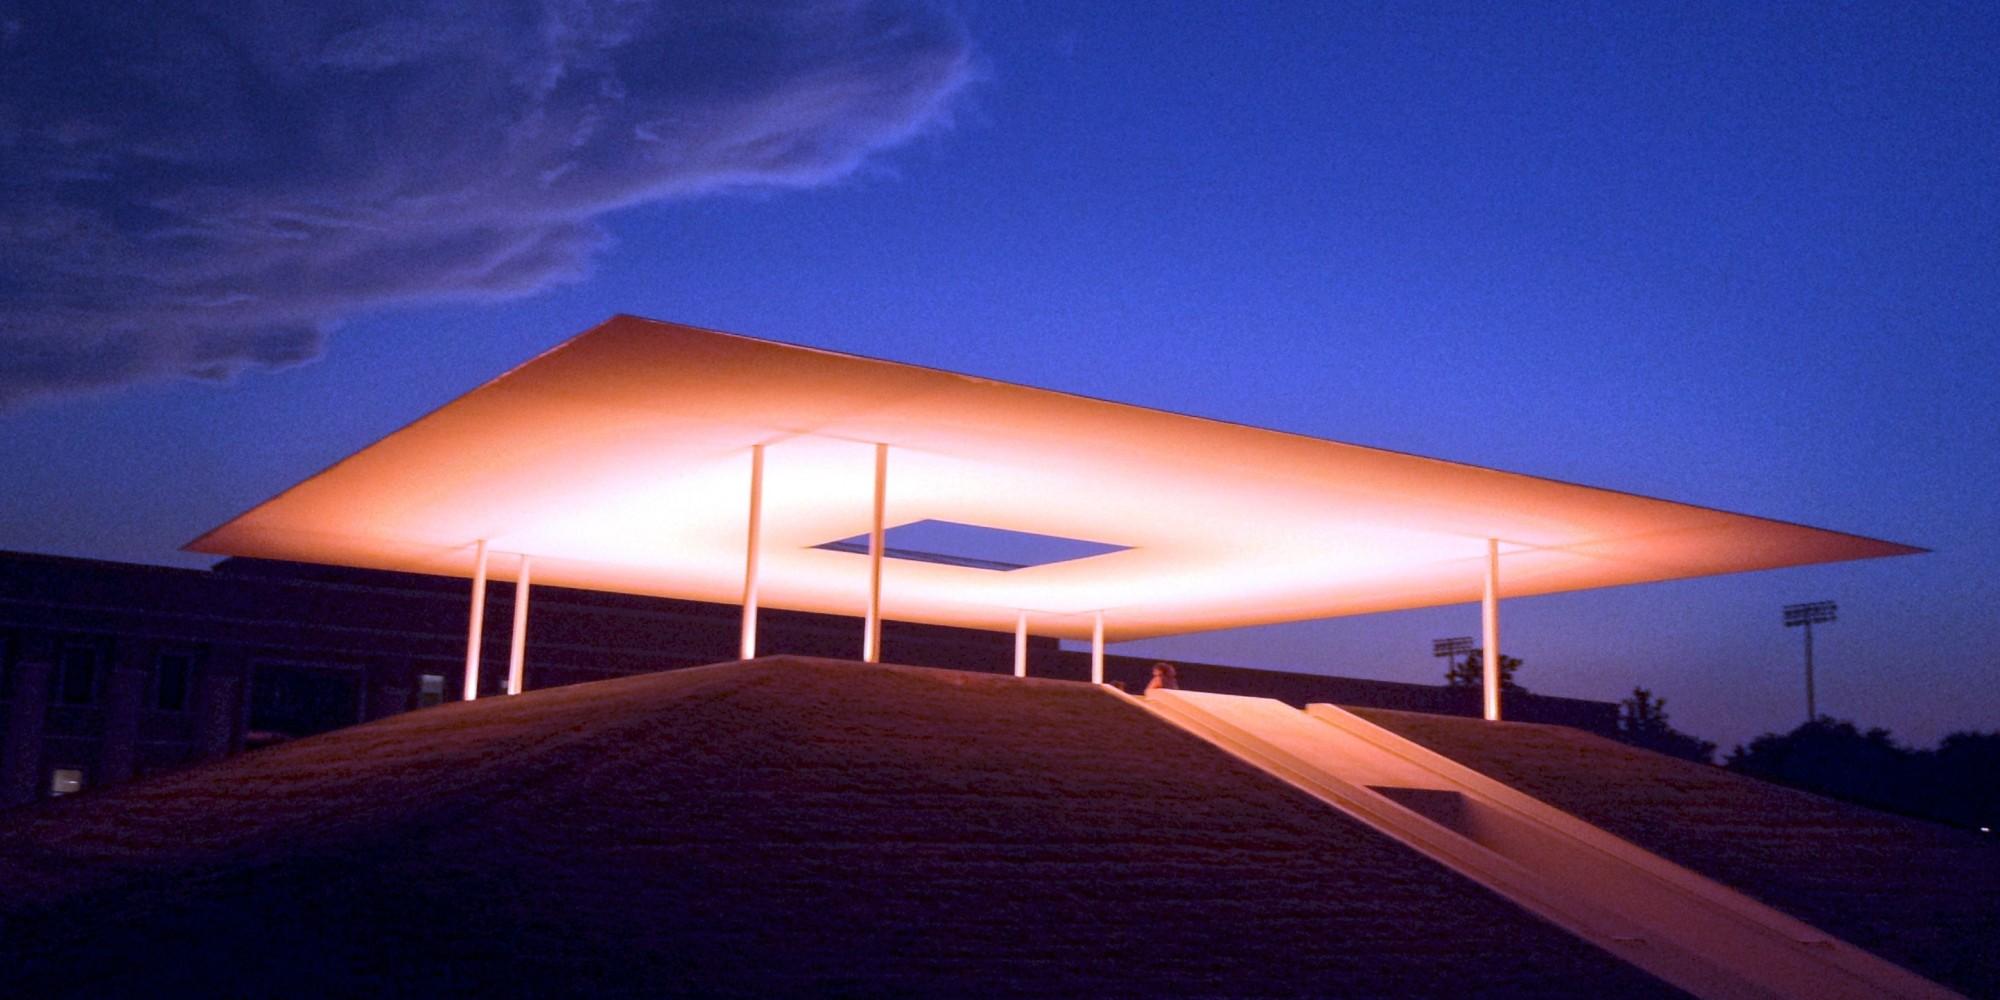 11 Art Destinations That Double As Therapeutic Retreats